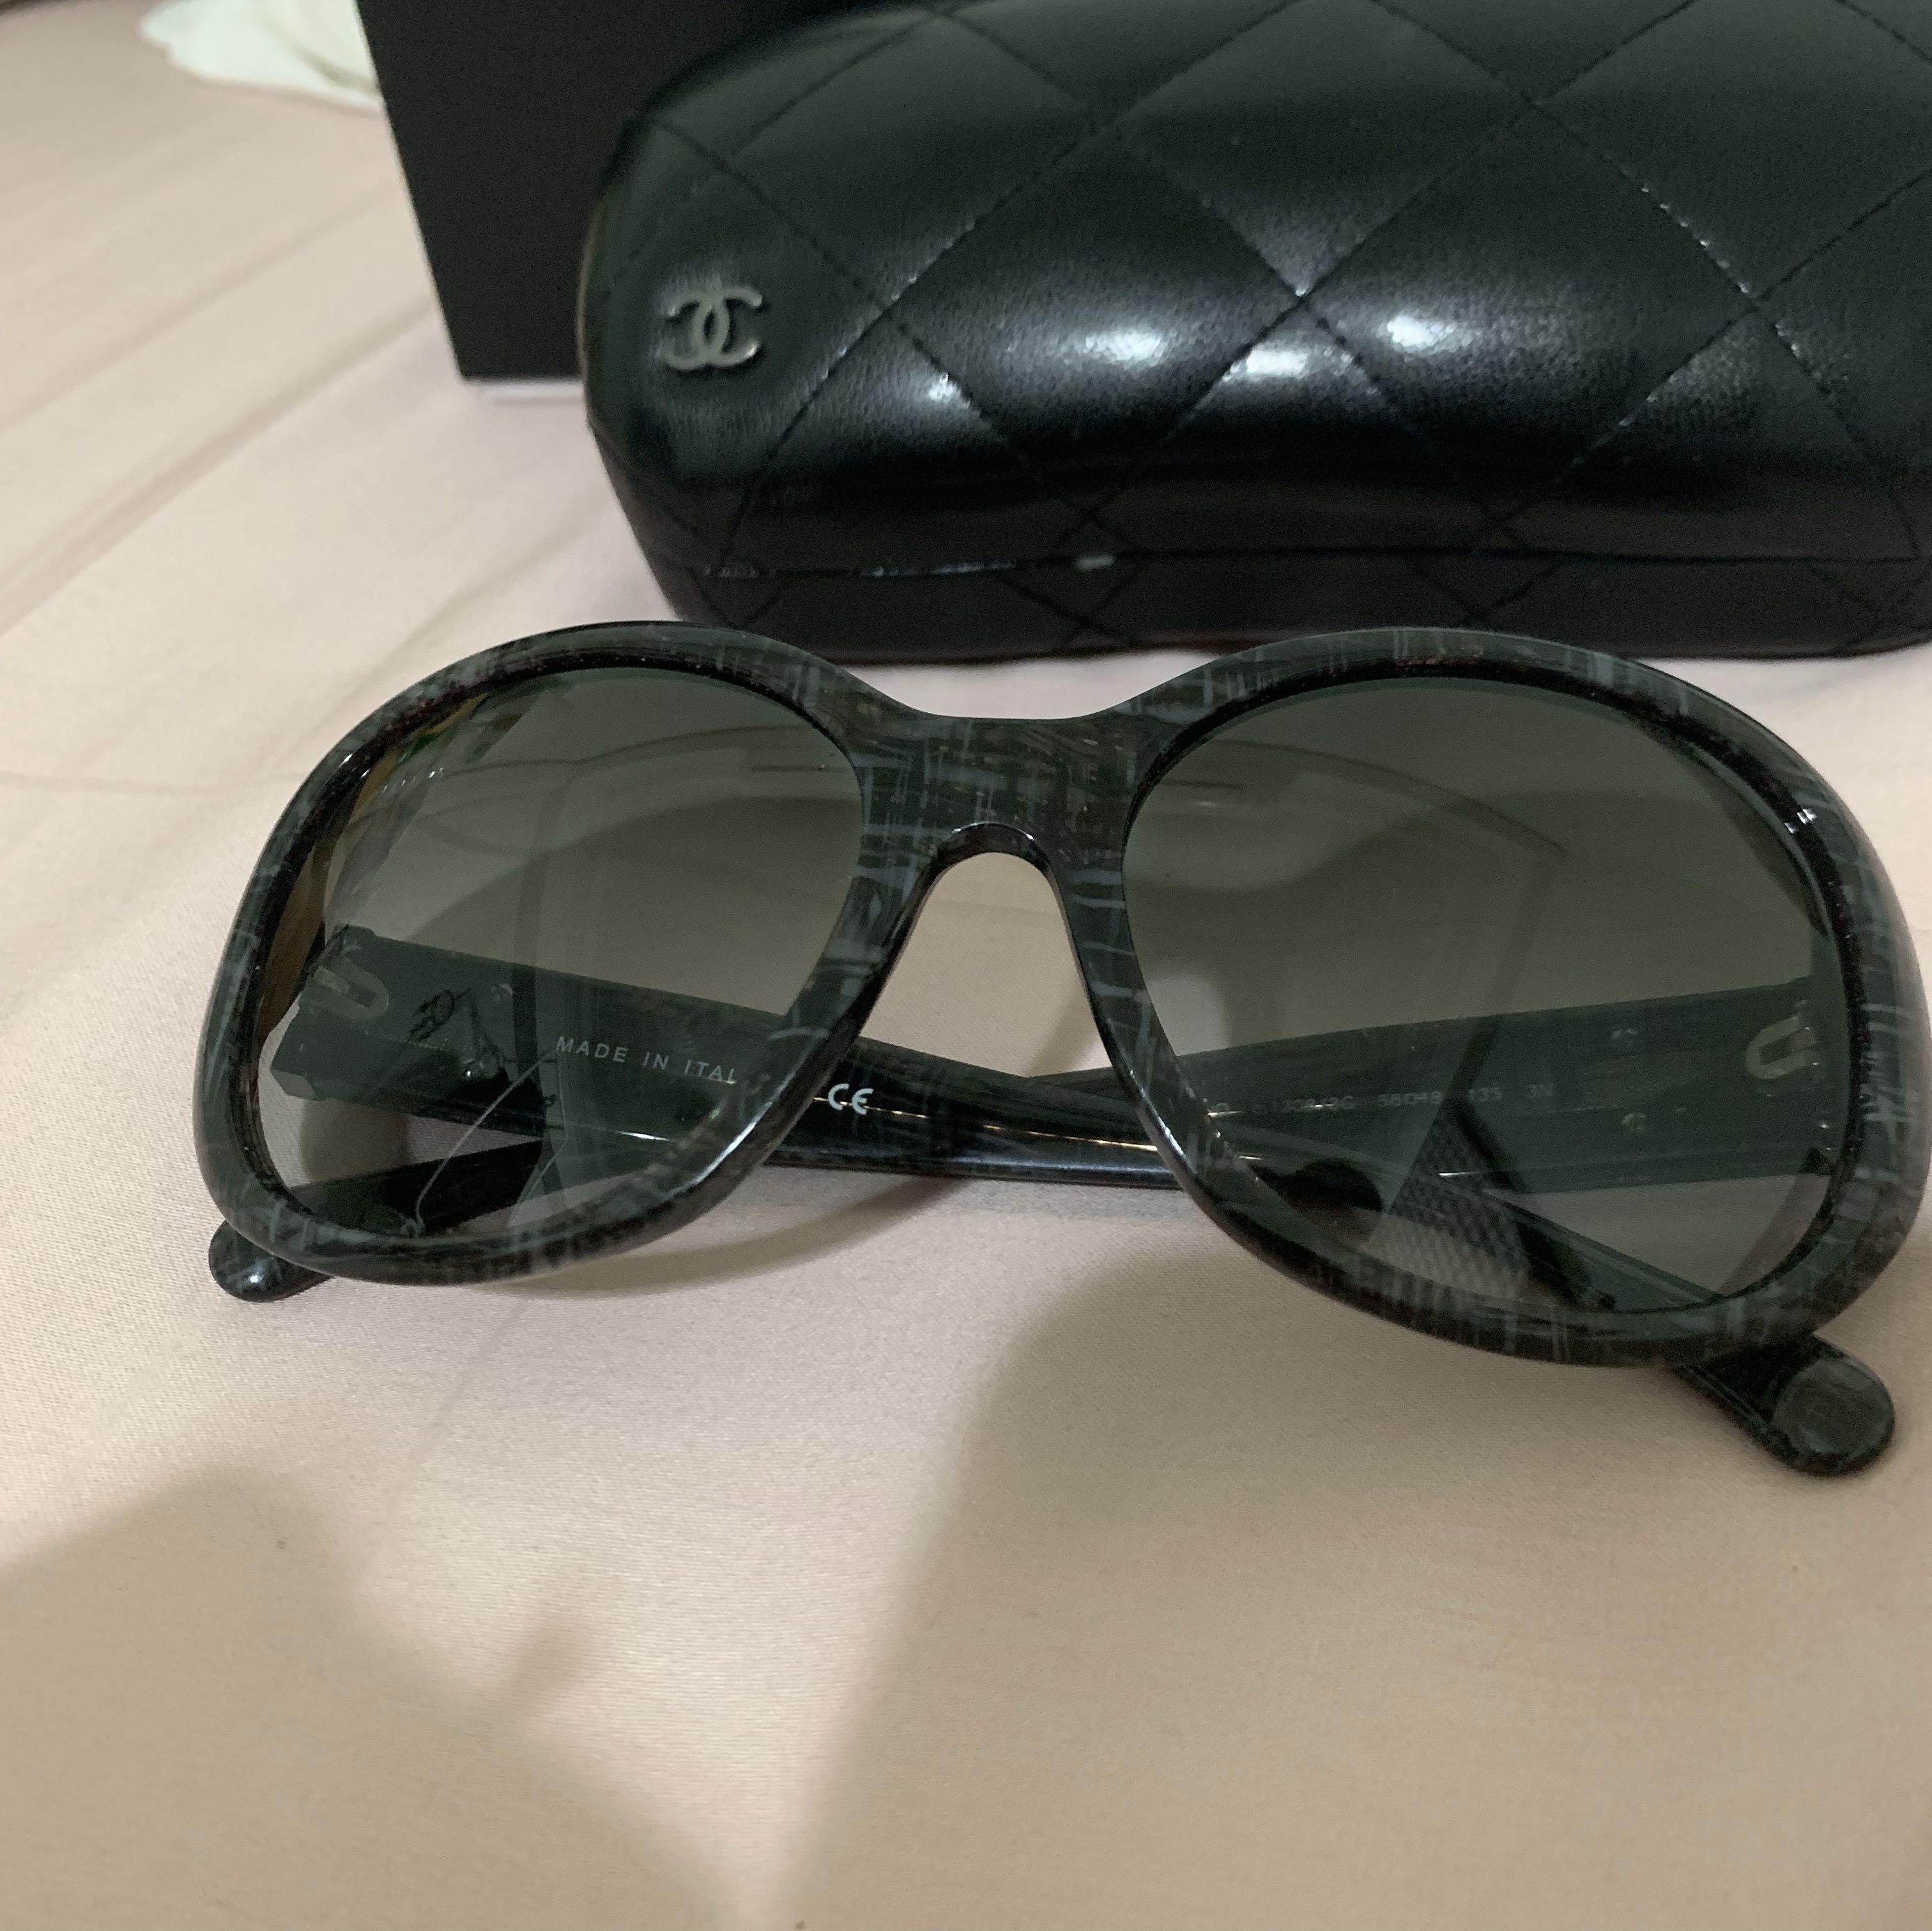 95f38f597f6 Chanel CC logo sunglasses